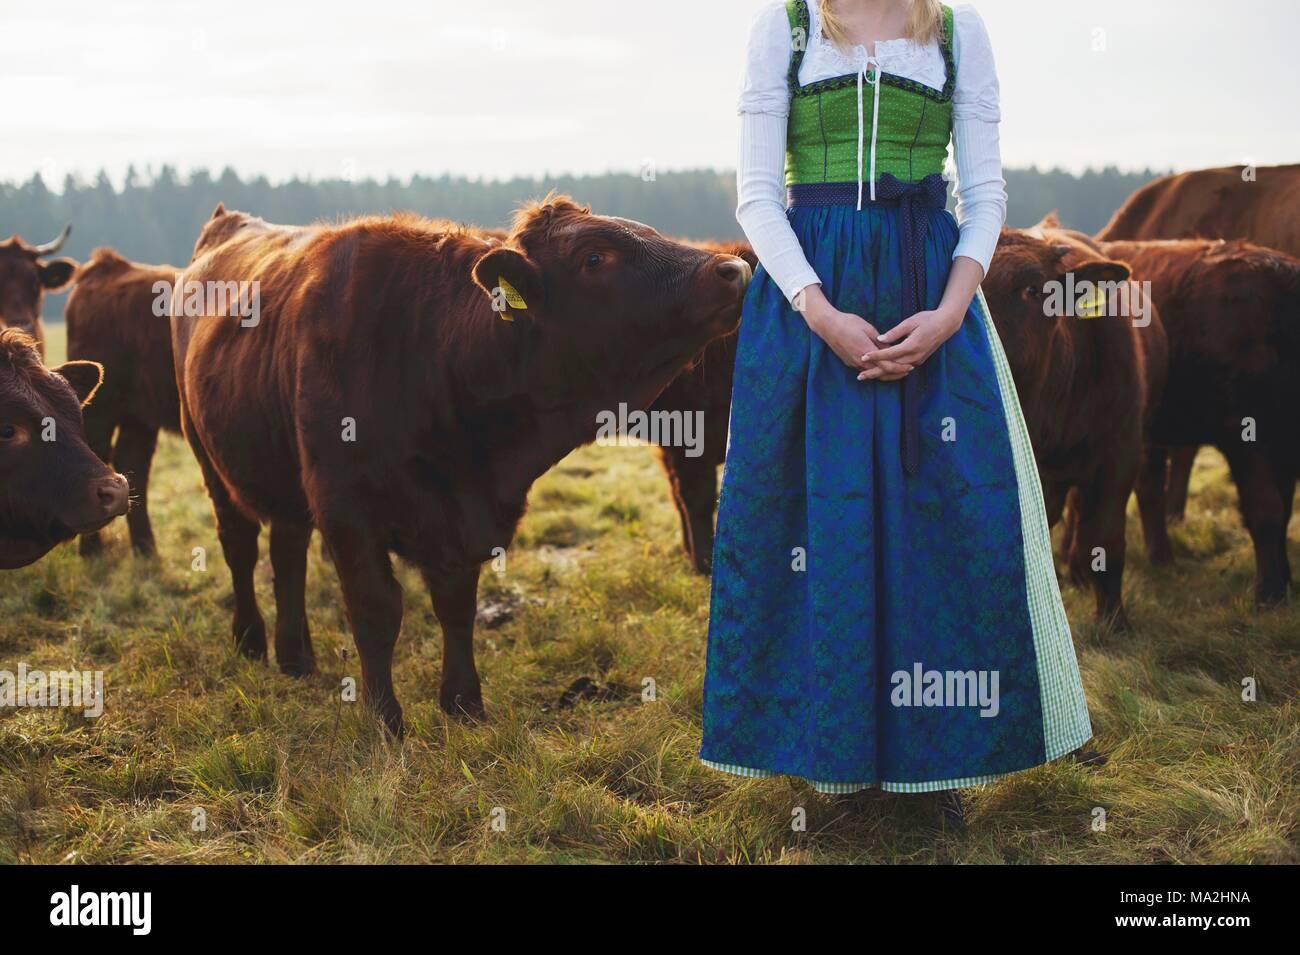 Landherzen datieren Bauern